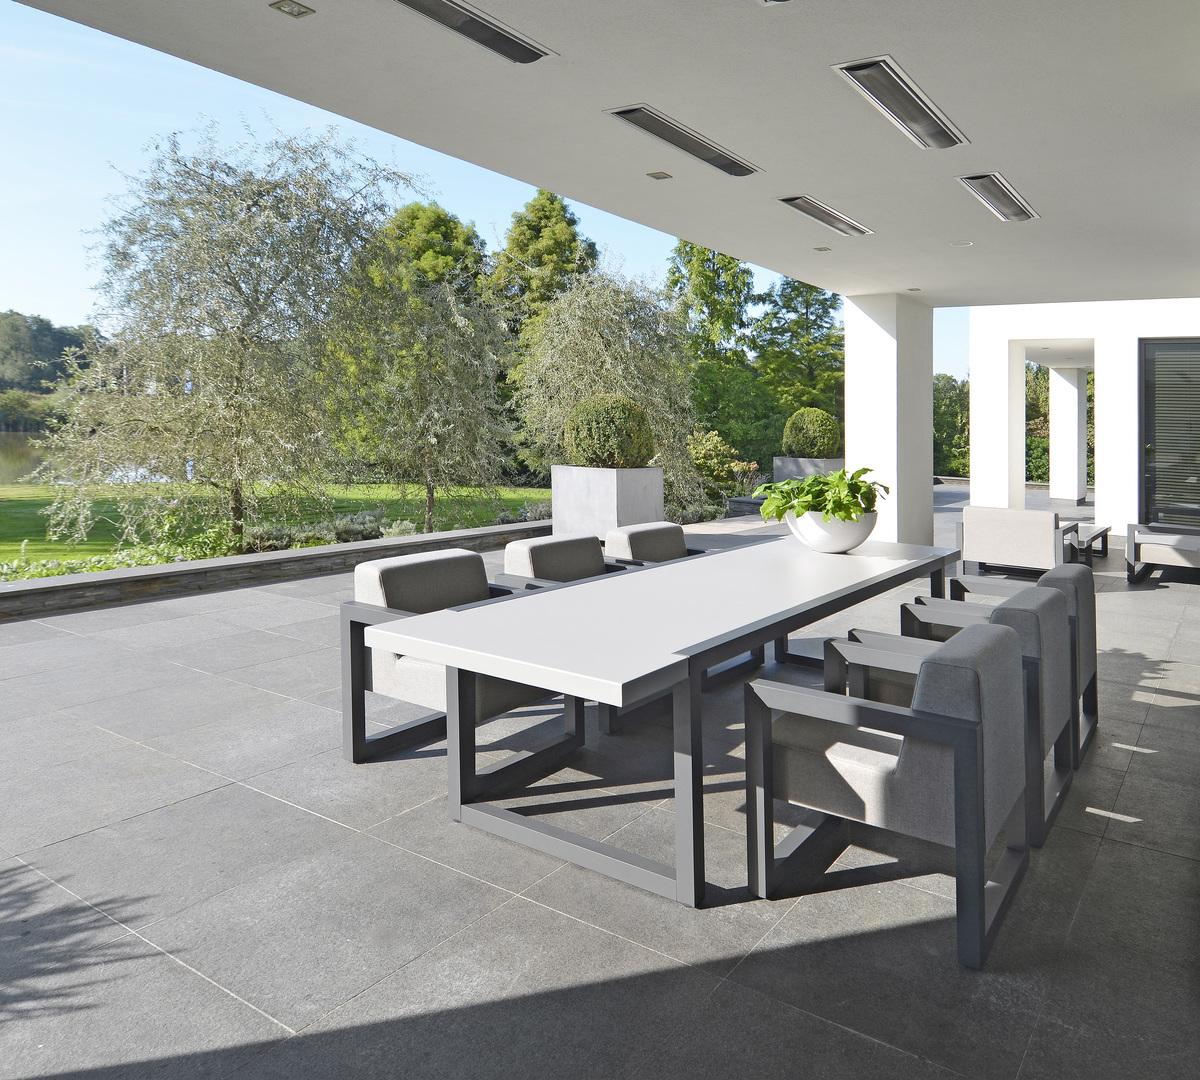 2017 Borek alu outdoor fabric Bergen dining chair - alu Bergen table.jpg